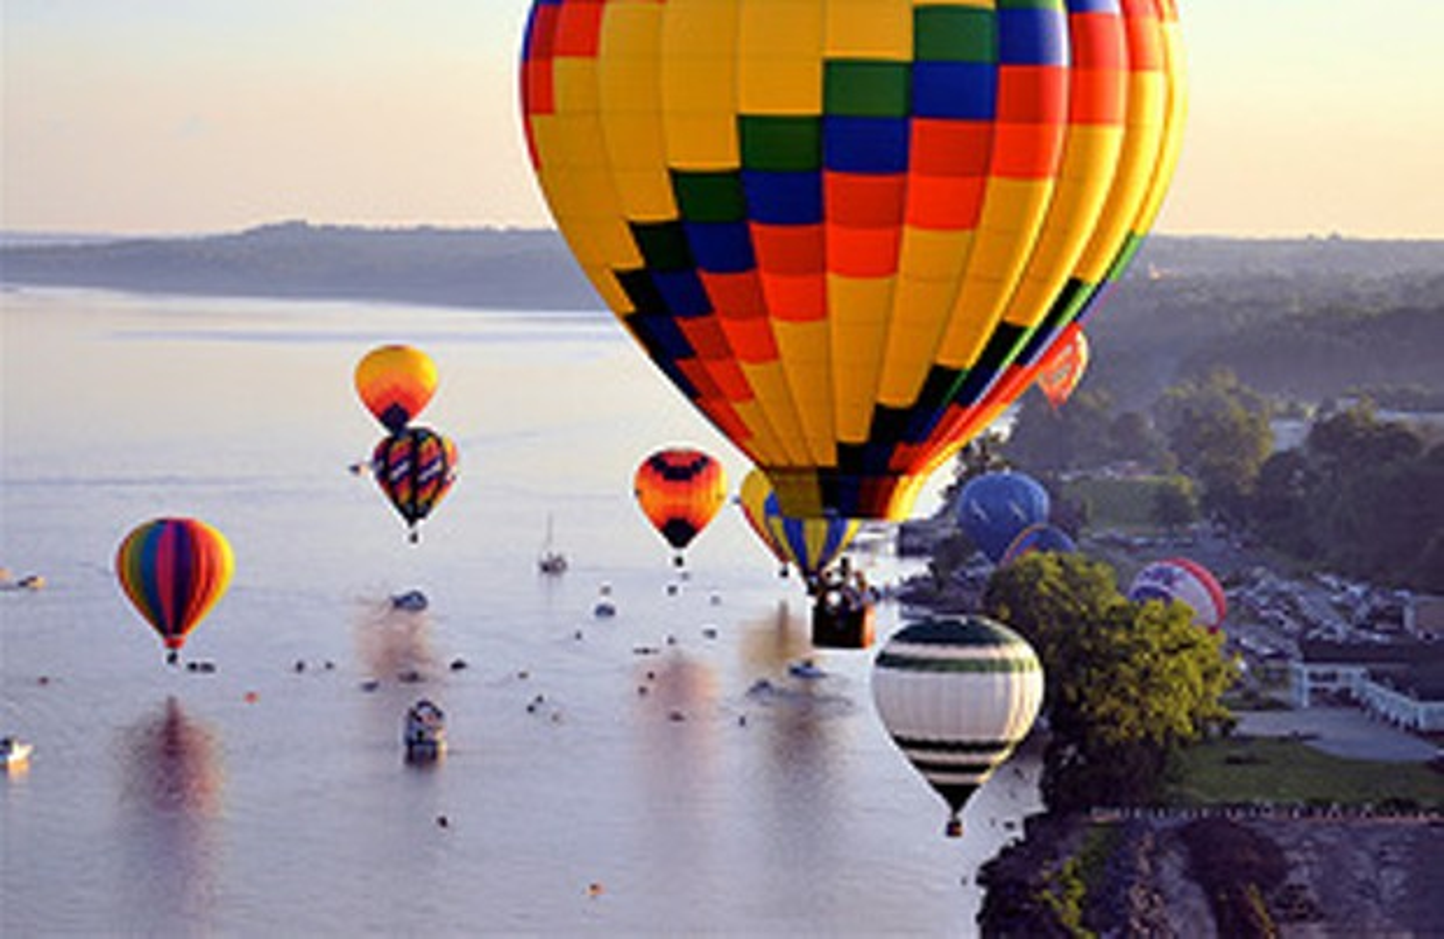 Hudson Valley Hot Air Balloon Festival Daily Dose